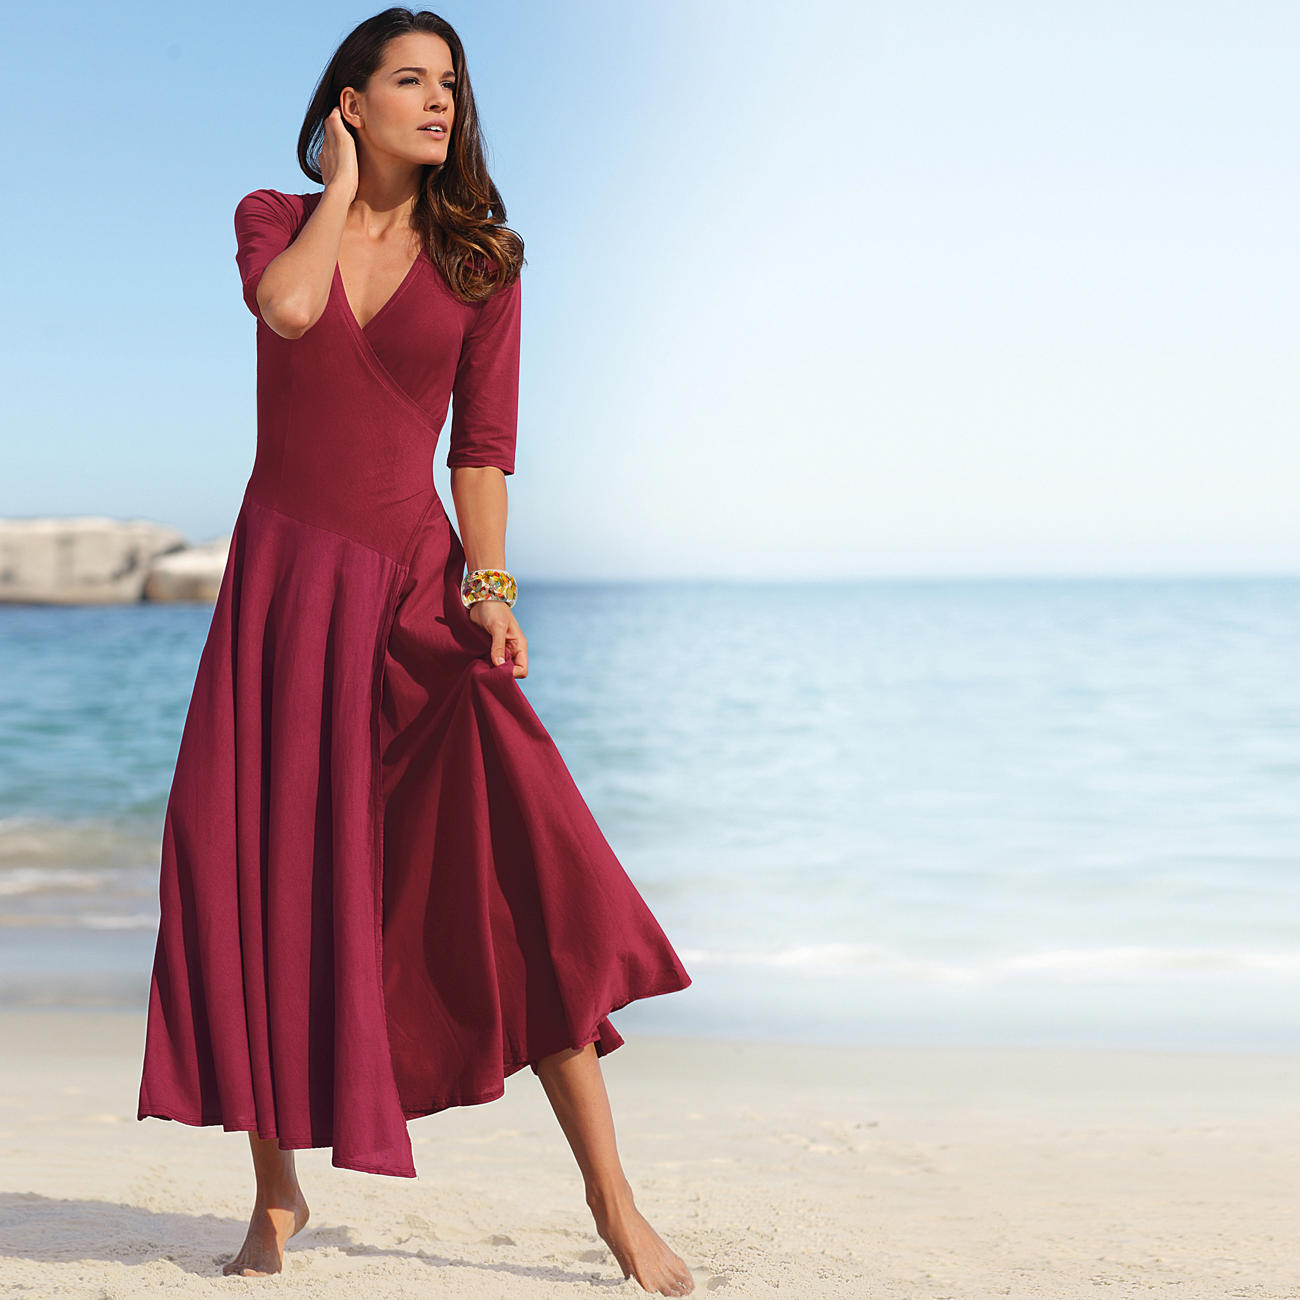 Buy Ibiza Dress 3 Year Product Guarantee